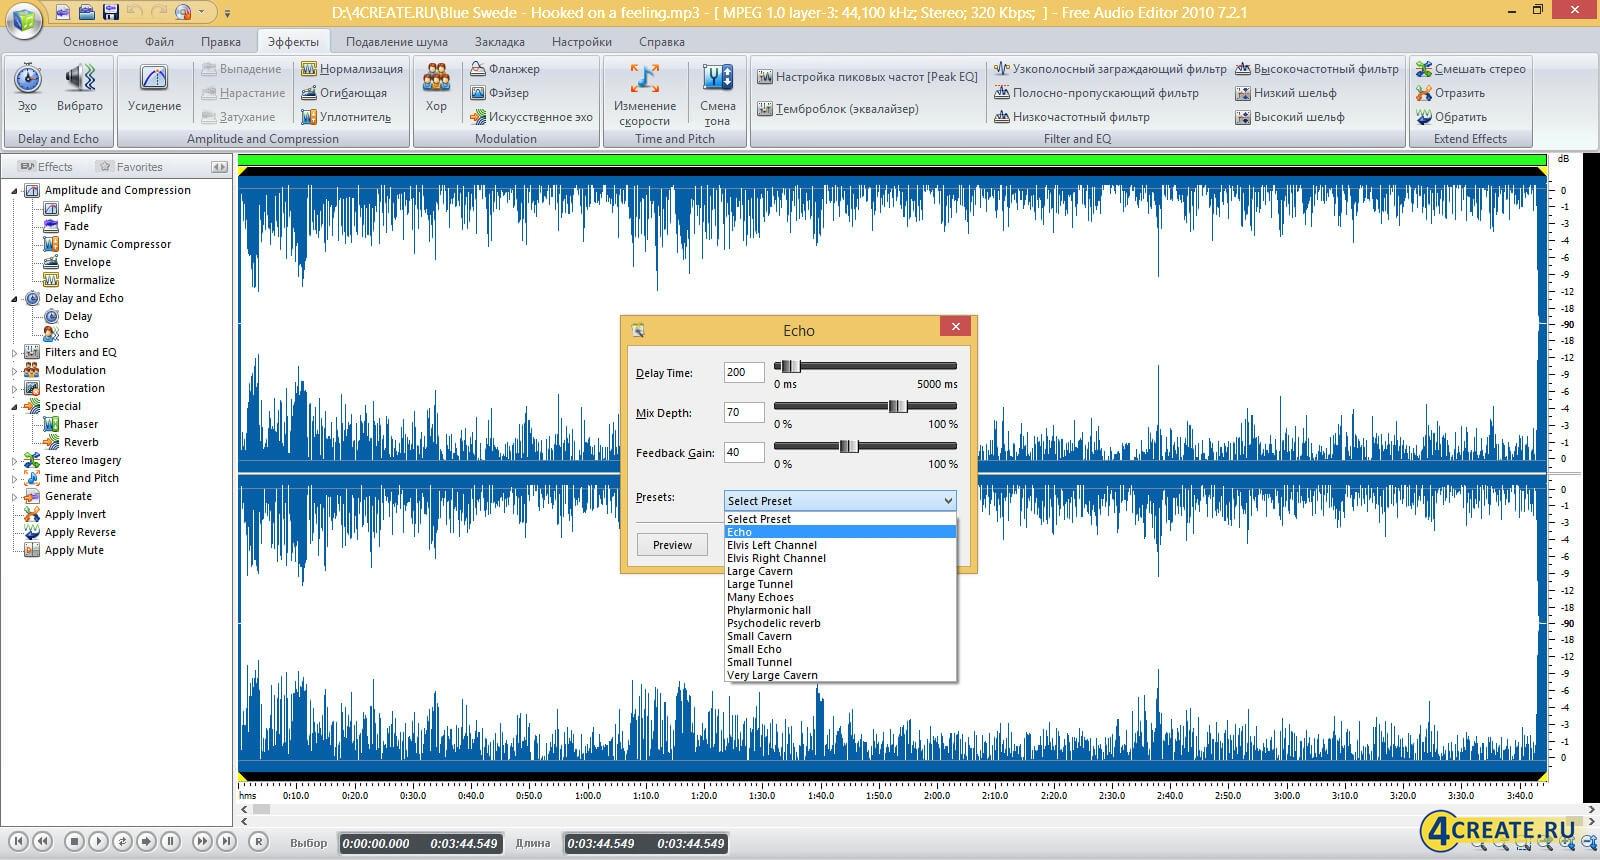 Free Audio Editor 7.2 (Скриншот 4)